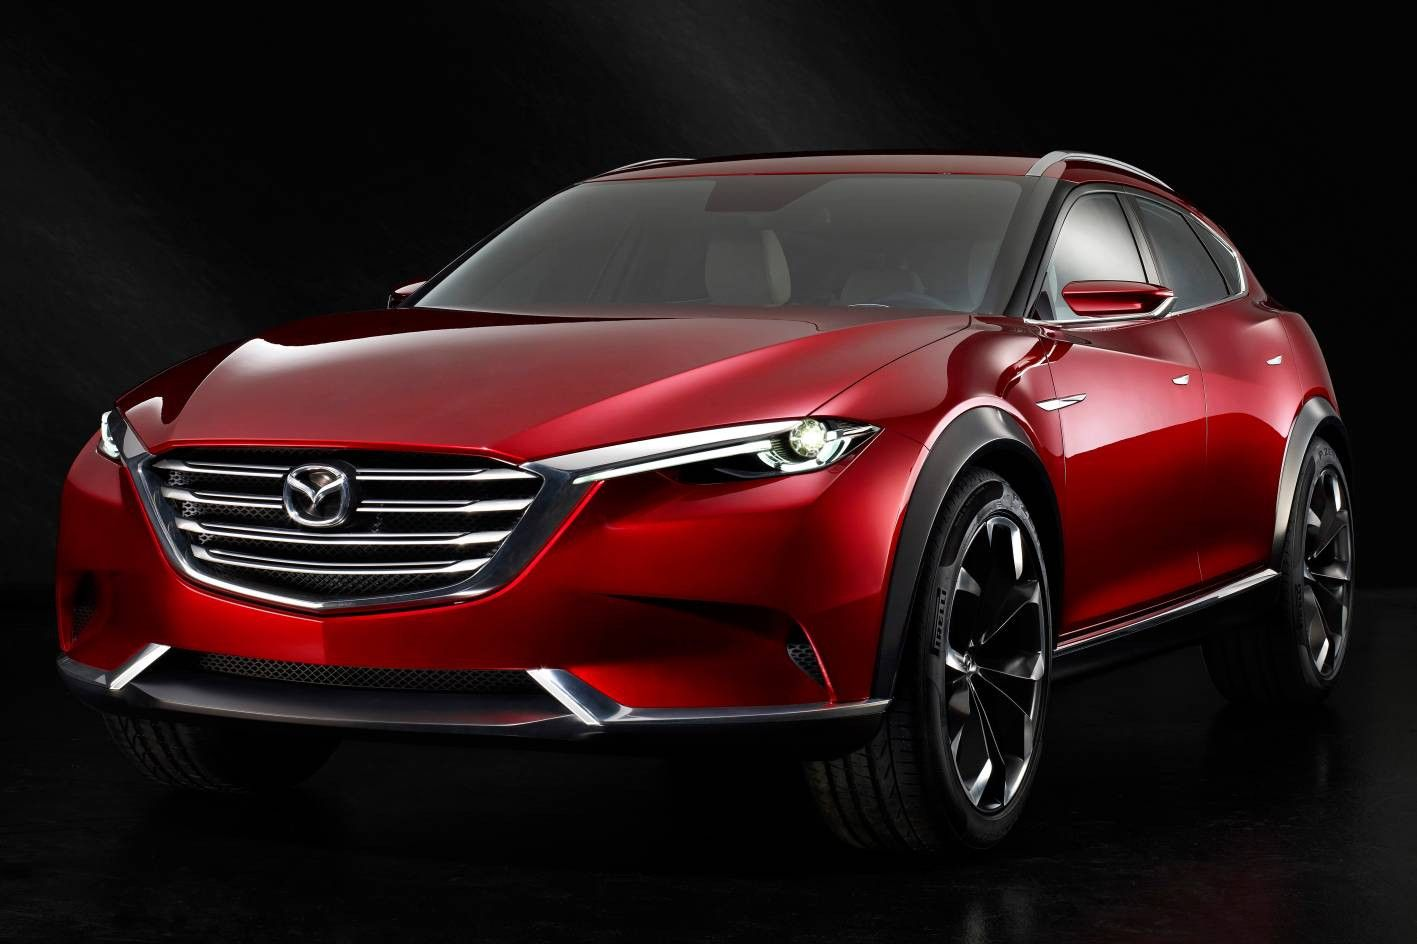 Mazda Cx 9 2020 Release Date New Engine Di 2020